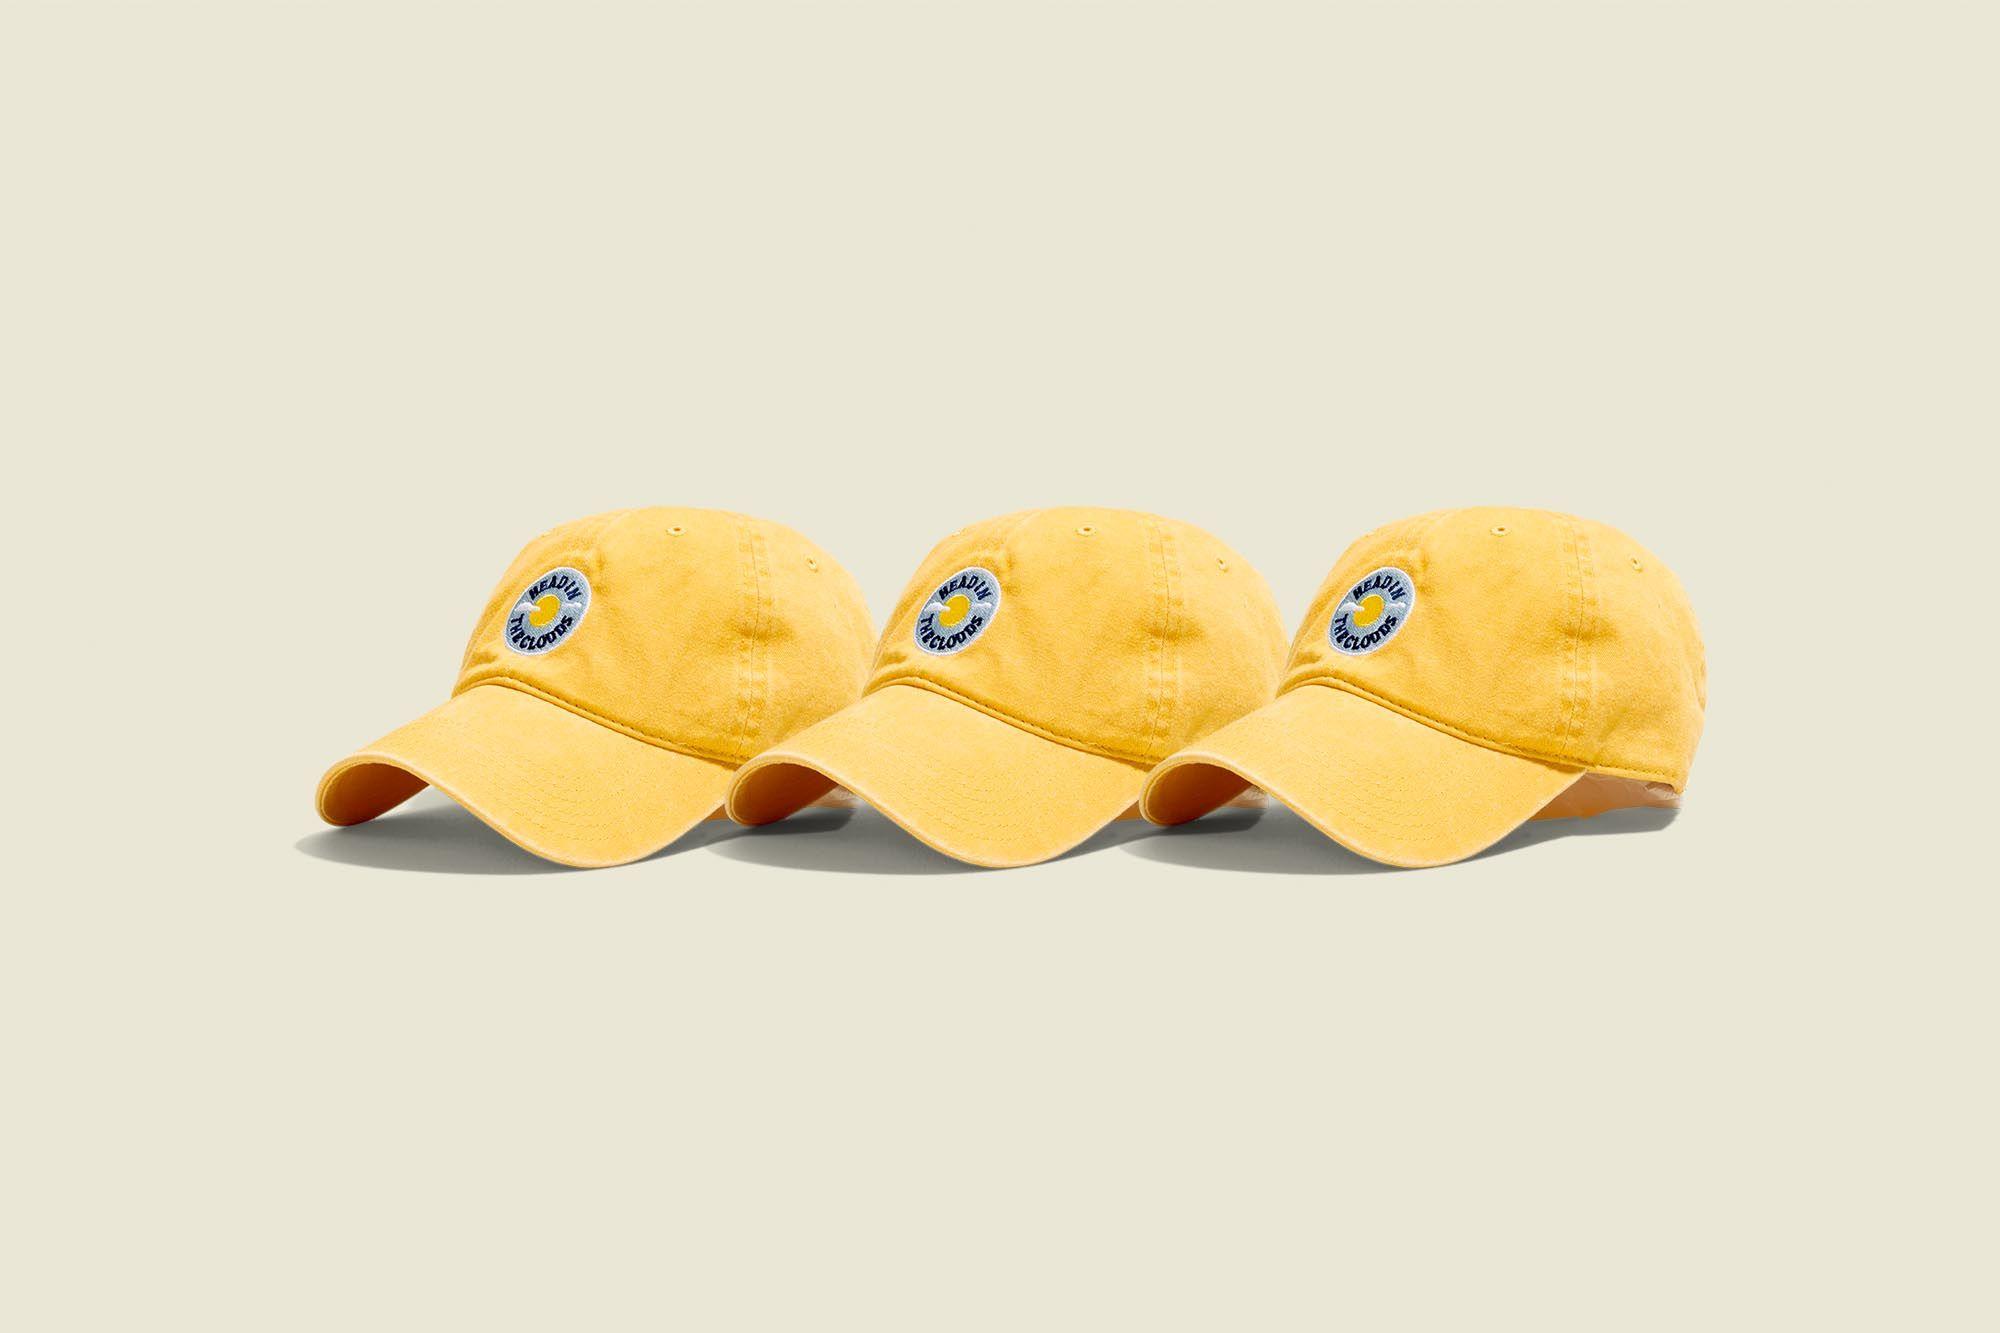 Three yellow hats